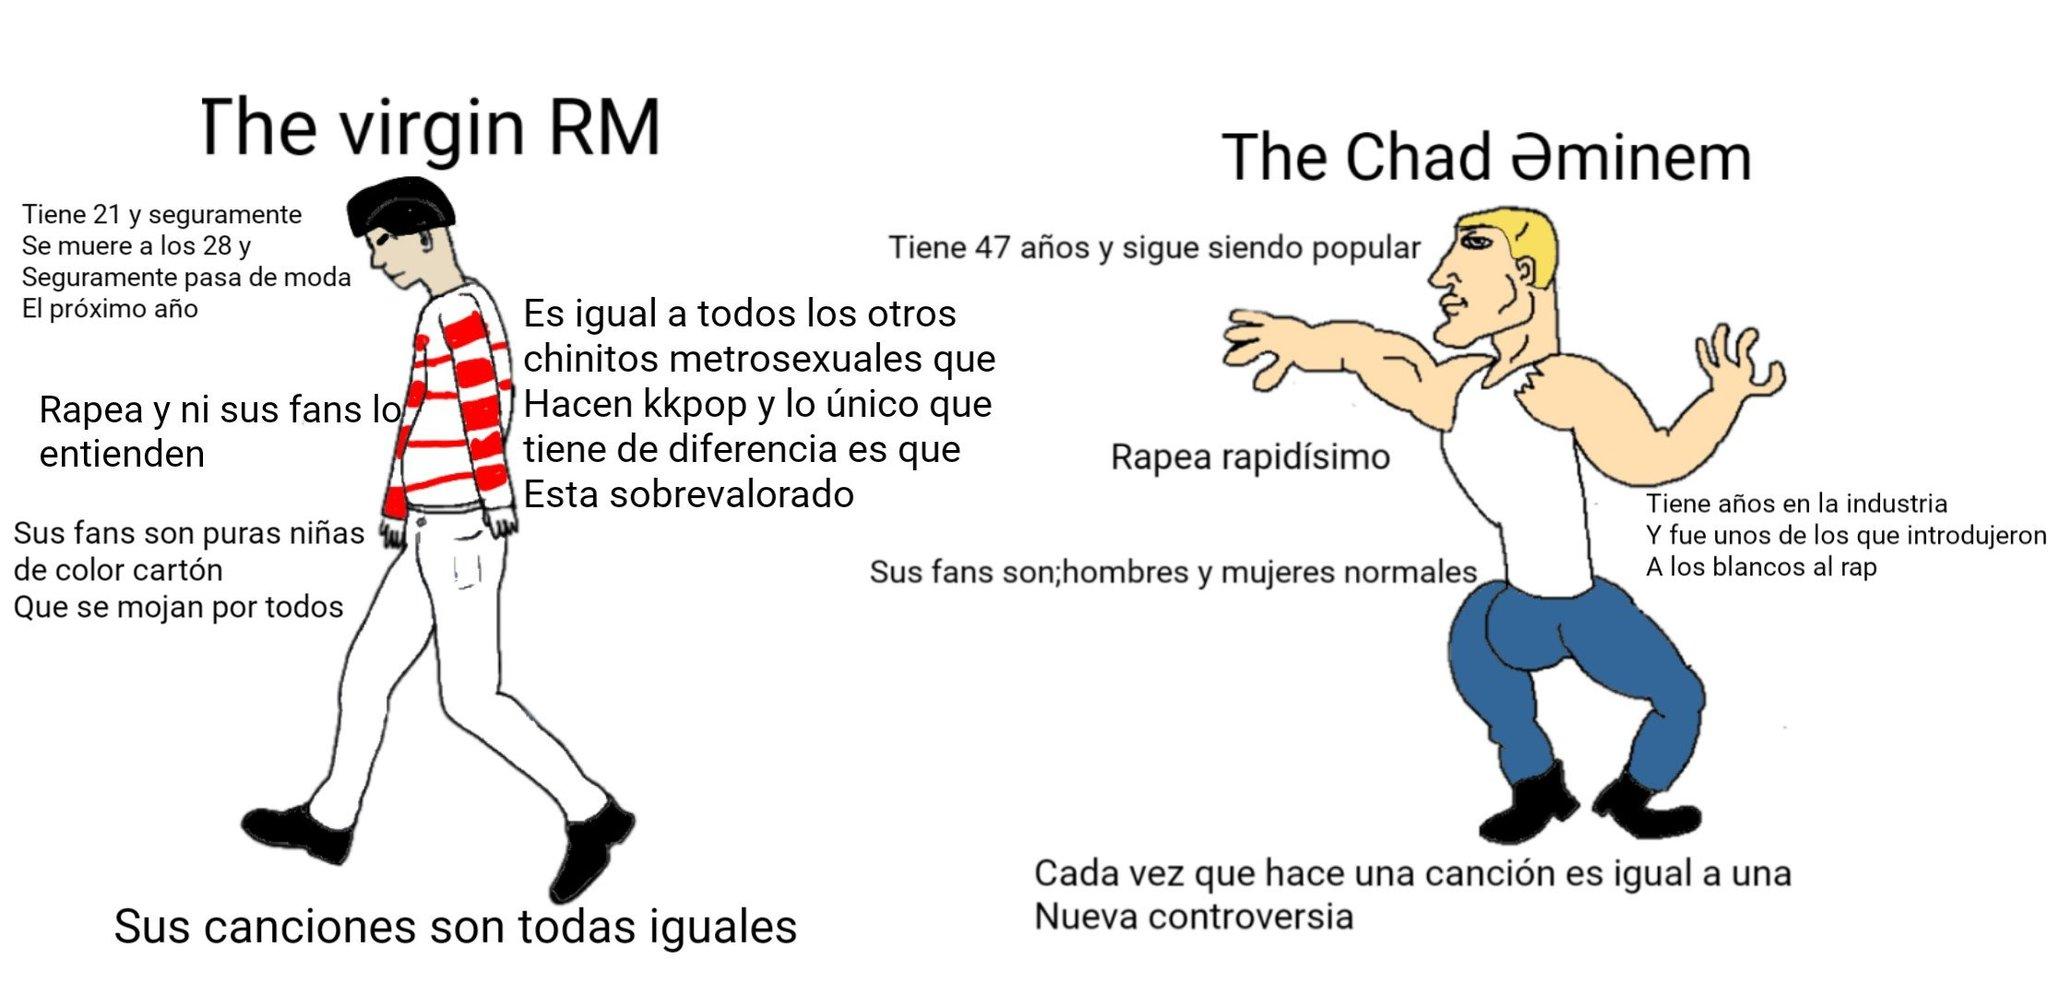 The chad eminem vs the virgin rm - meme